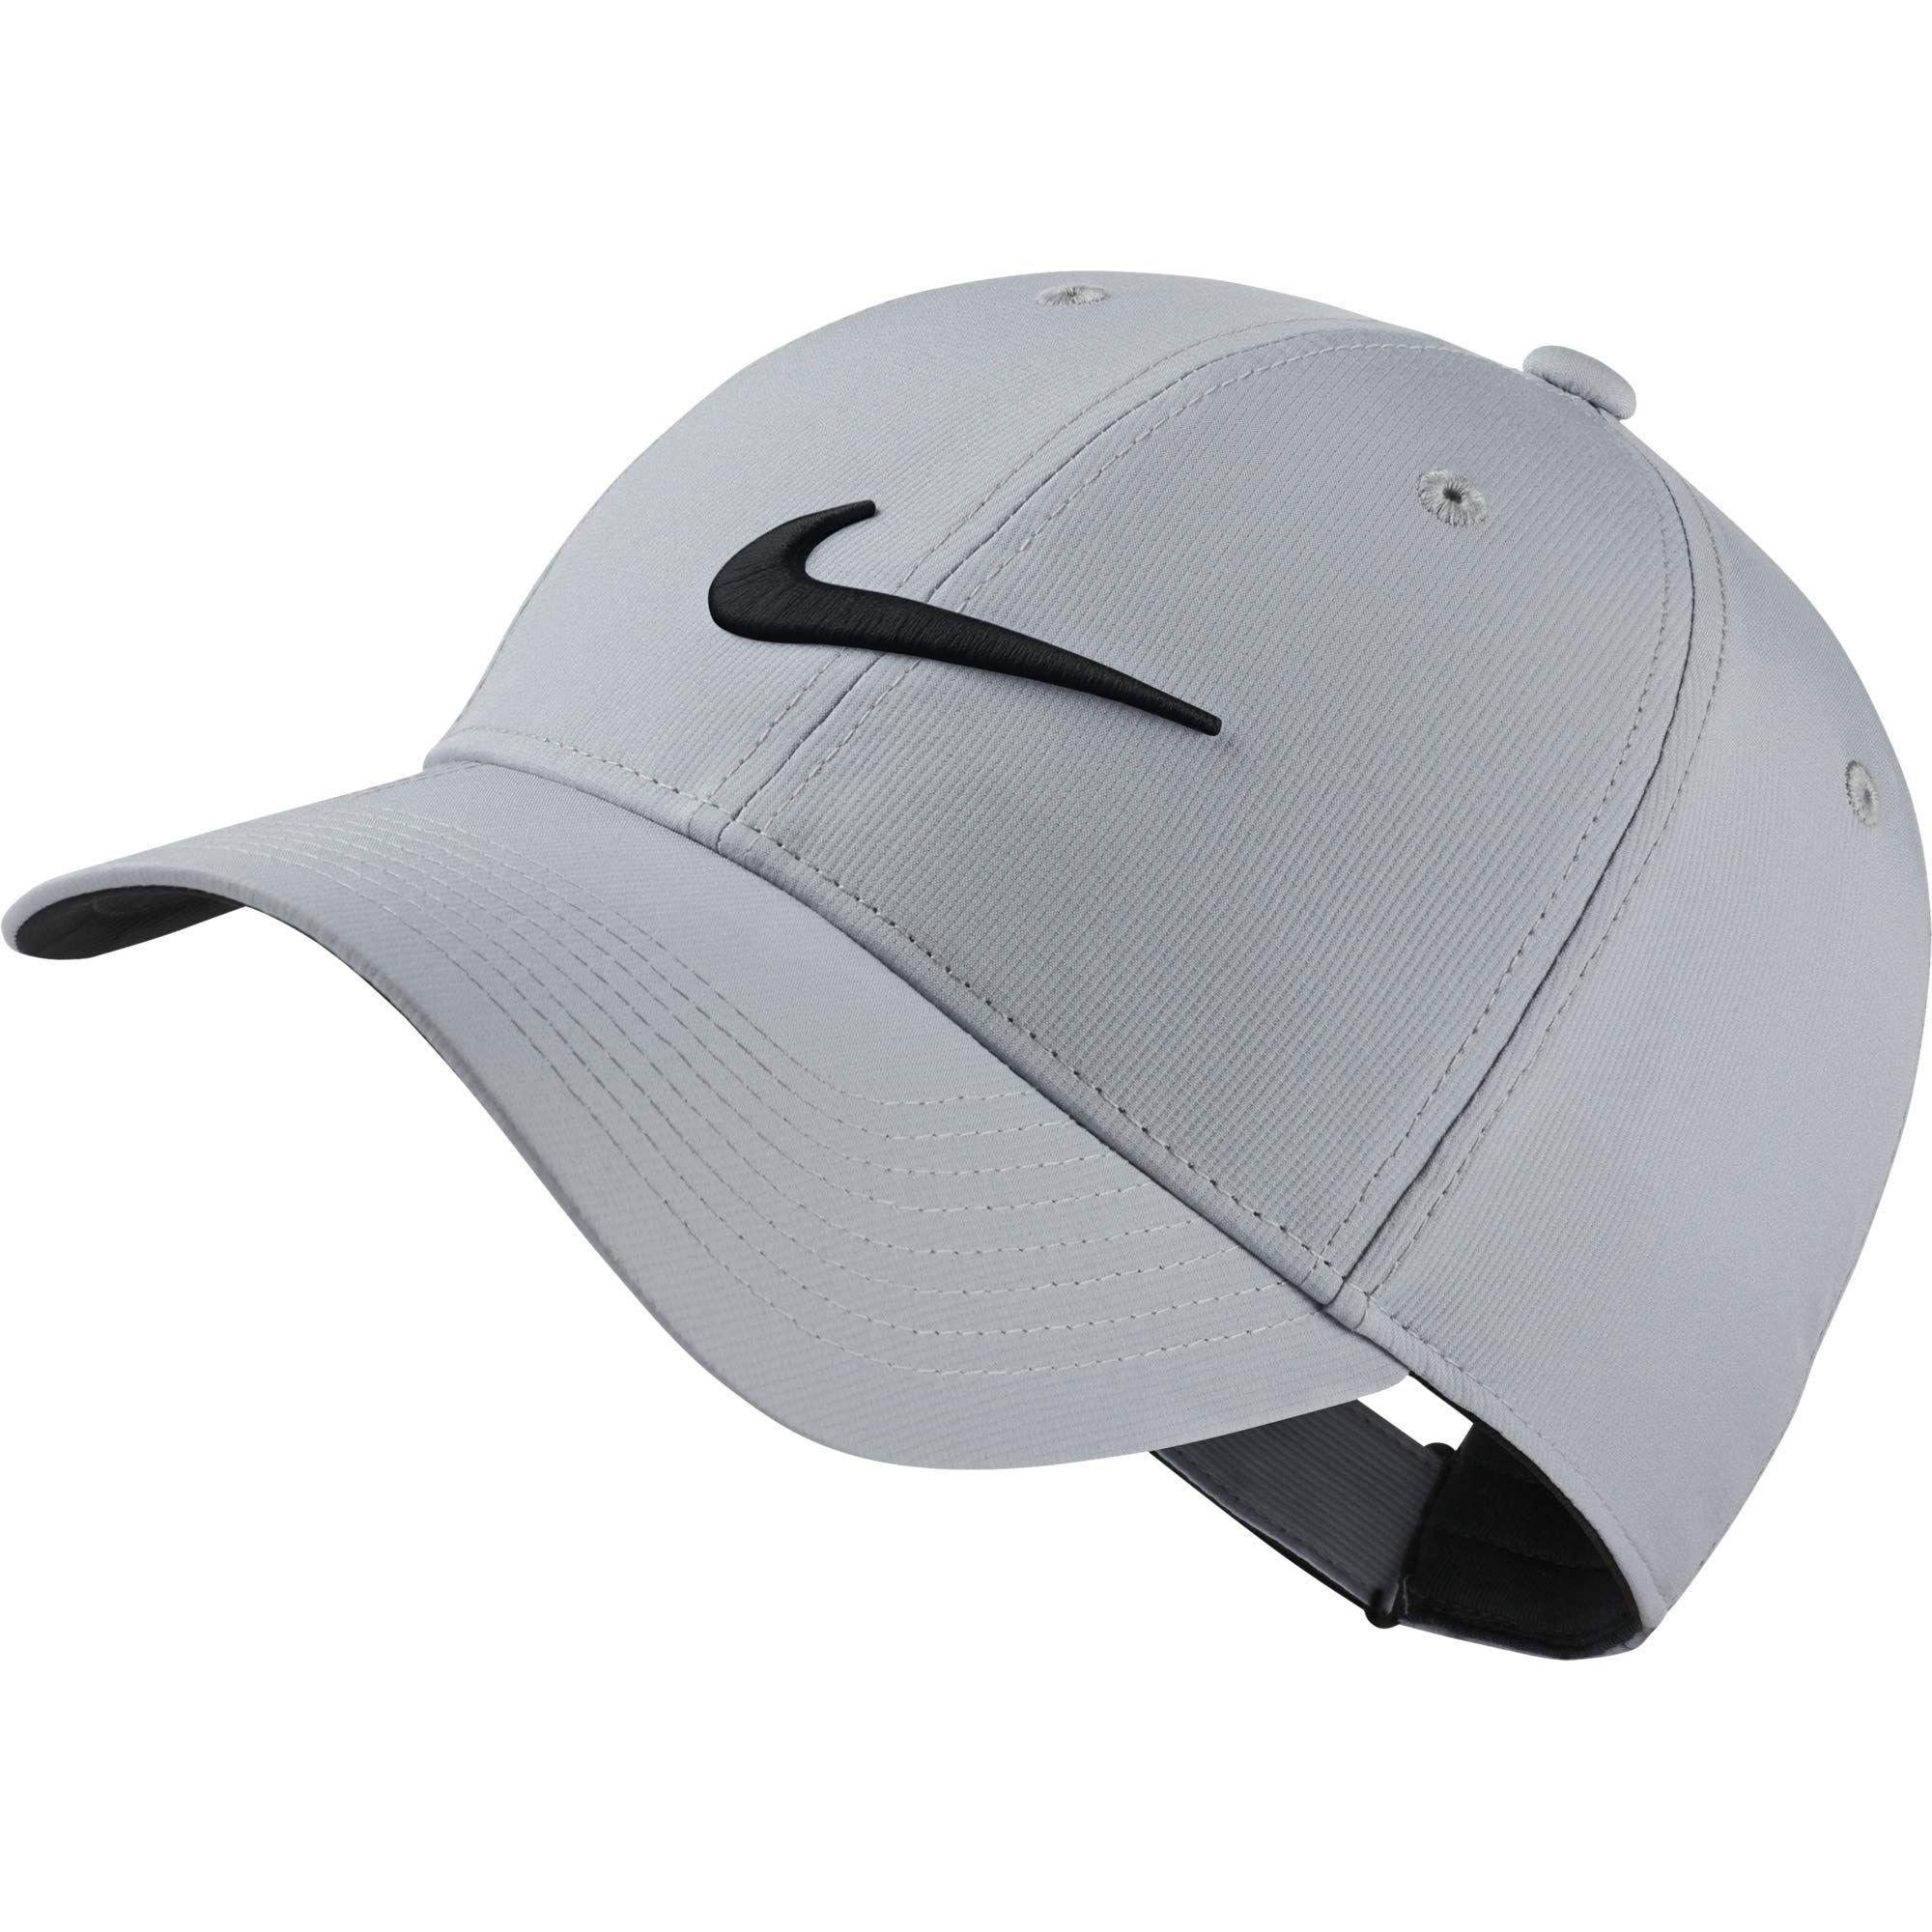 resistencia Mm Político  Nike Unisex L91 Cap Tech Hat   Gorra adidas, Nike sb, Gorras